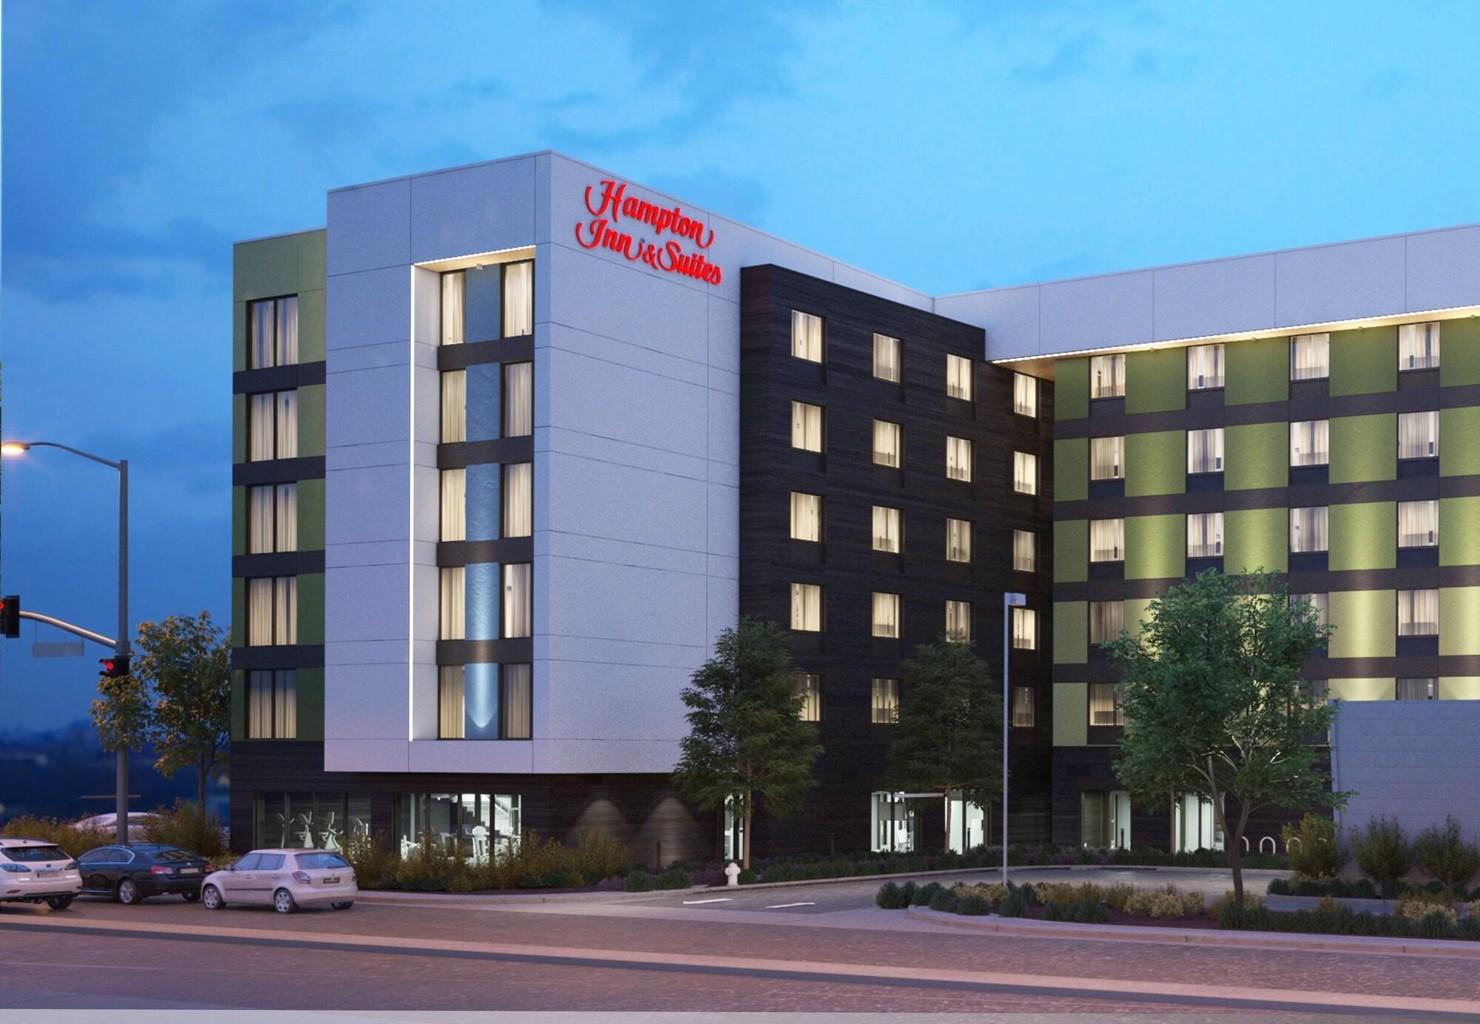 Hampton Inn & Suites Las Vegas Convention Center NV